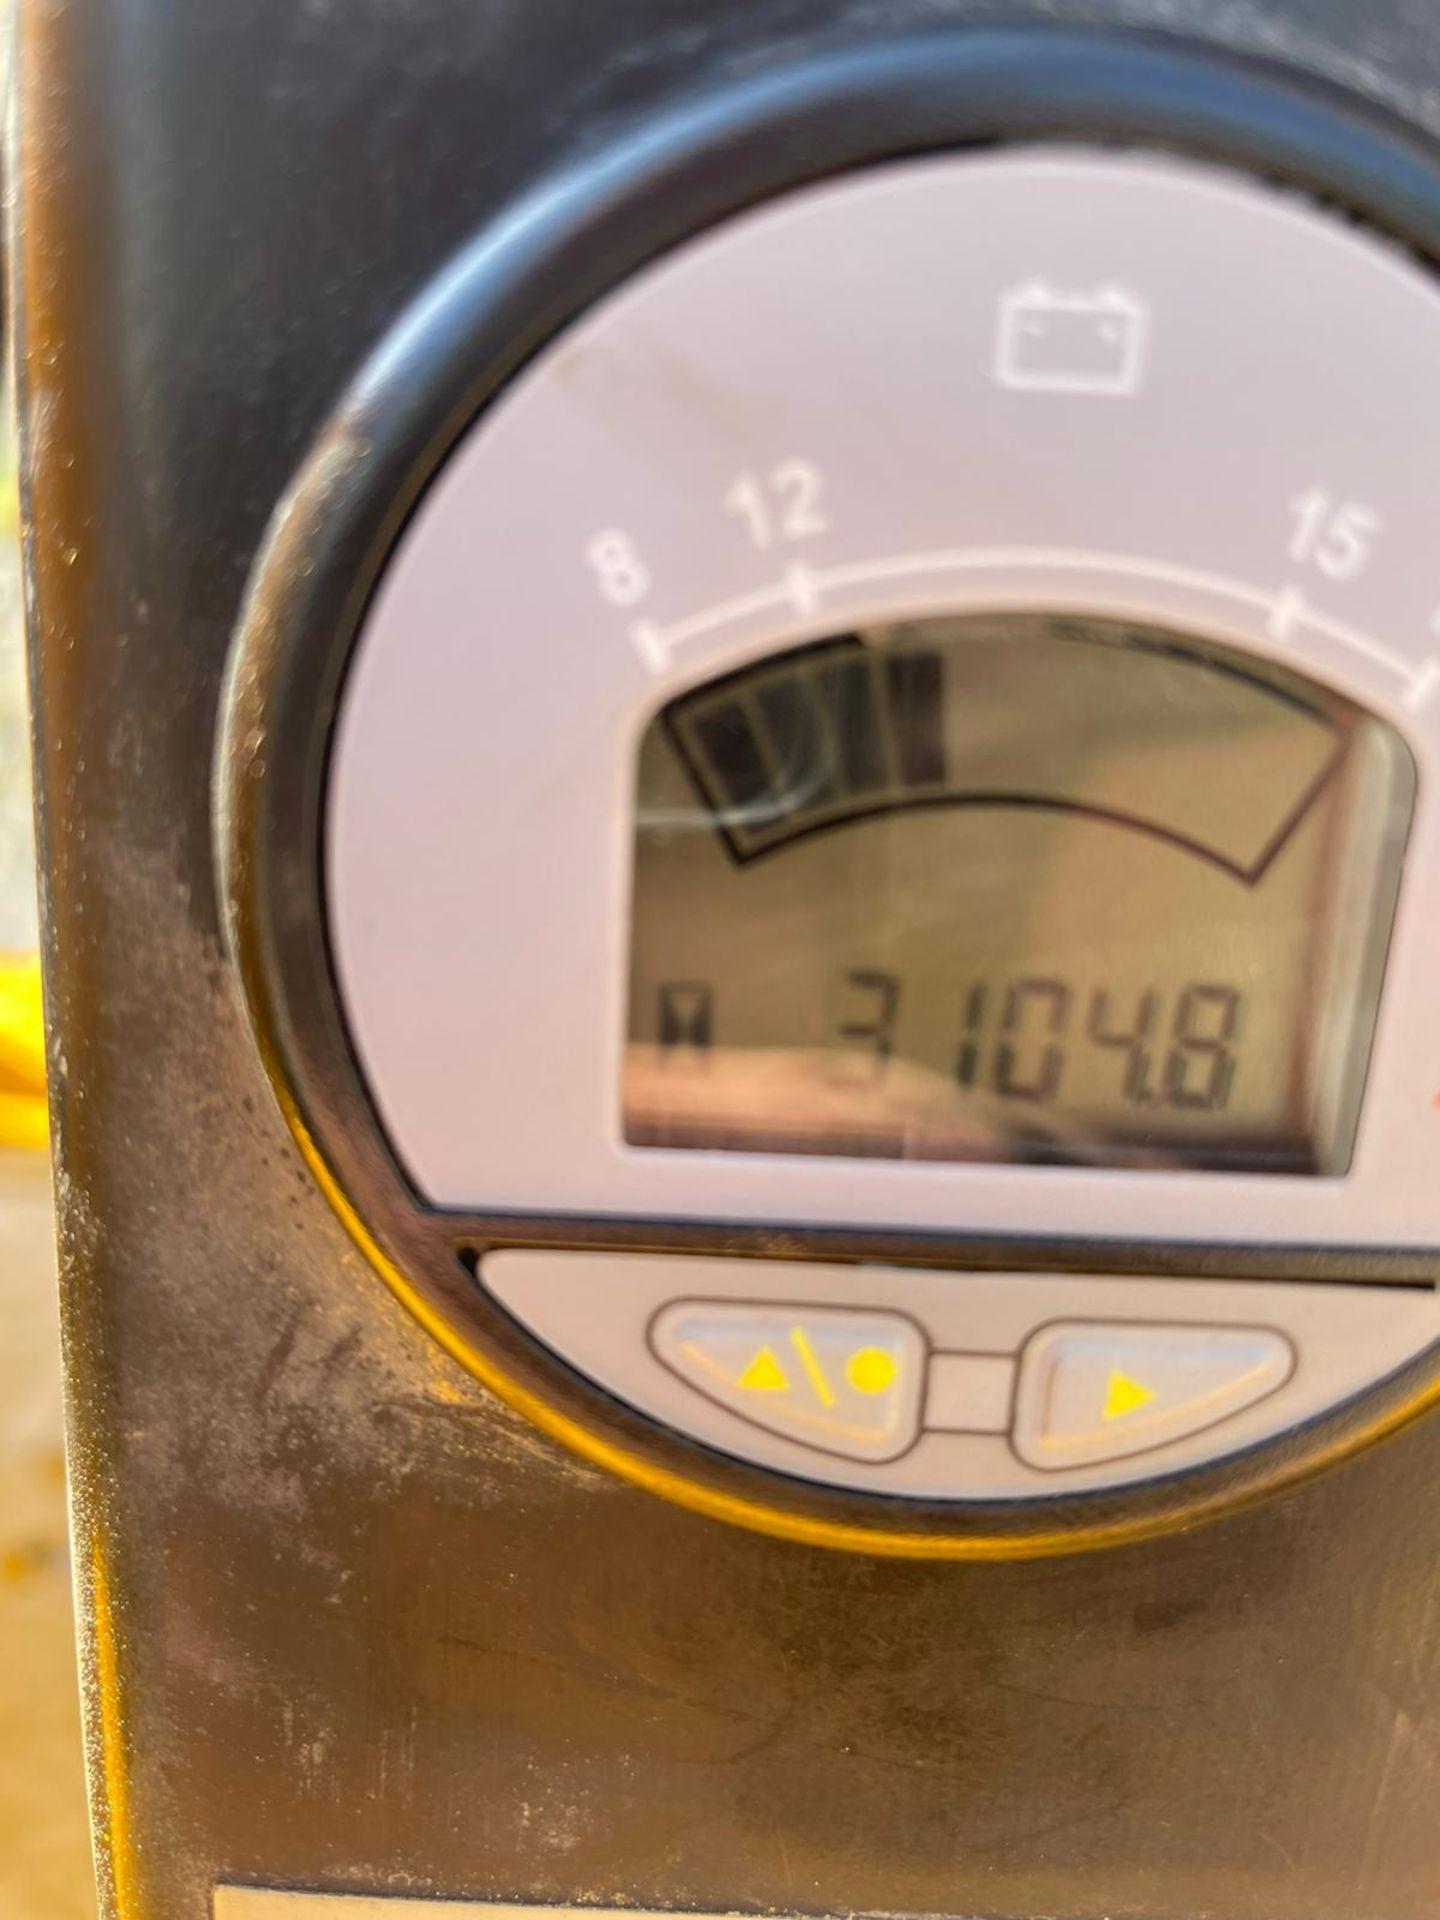 2014 THWAITES 9 TON STRAIGHT TIP DUMPER, 3,104 RECORDED HOURS, 4 WHEEL DRIVE *PLUS VAT* - Image 7 of 10